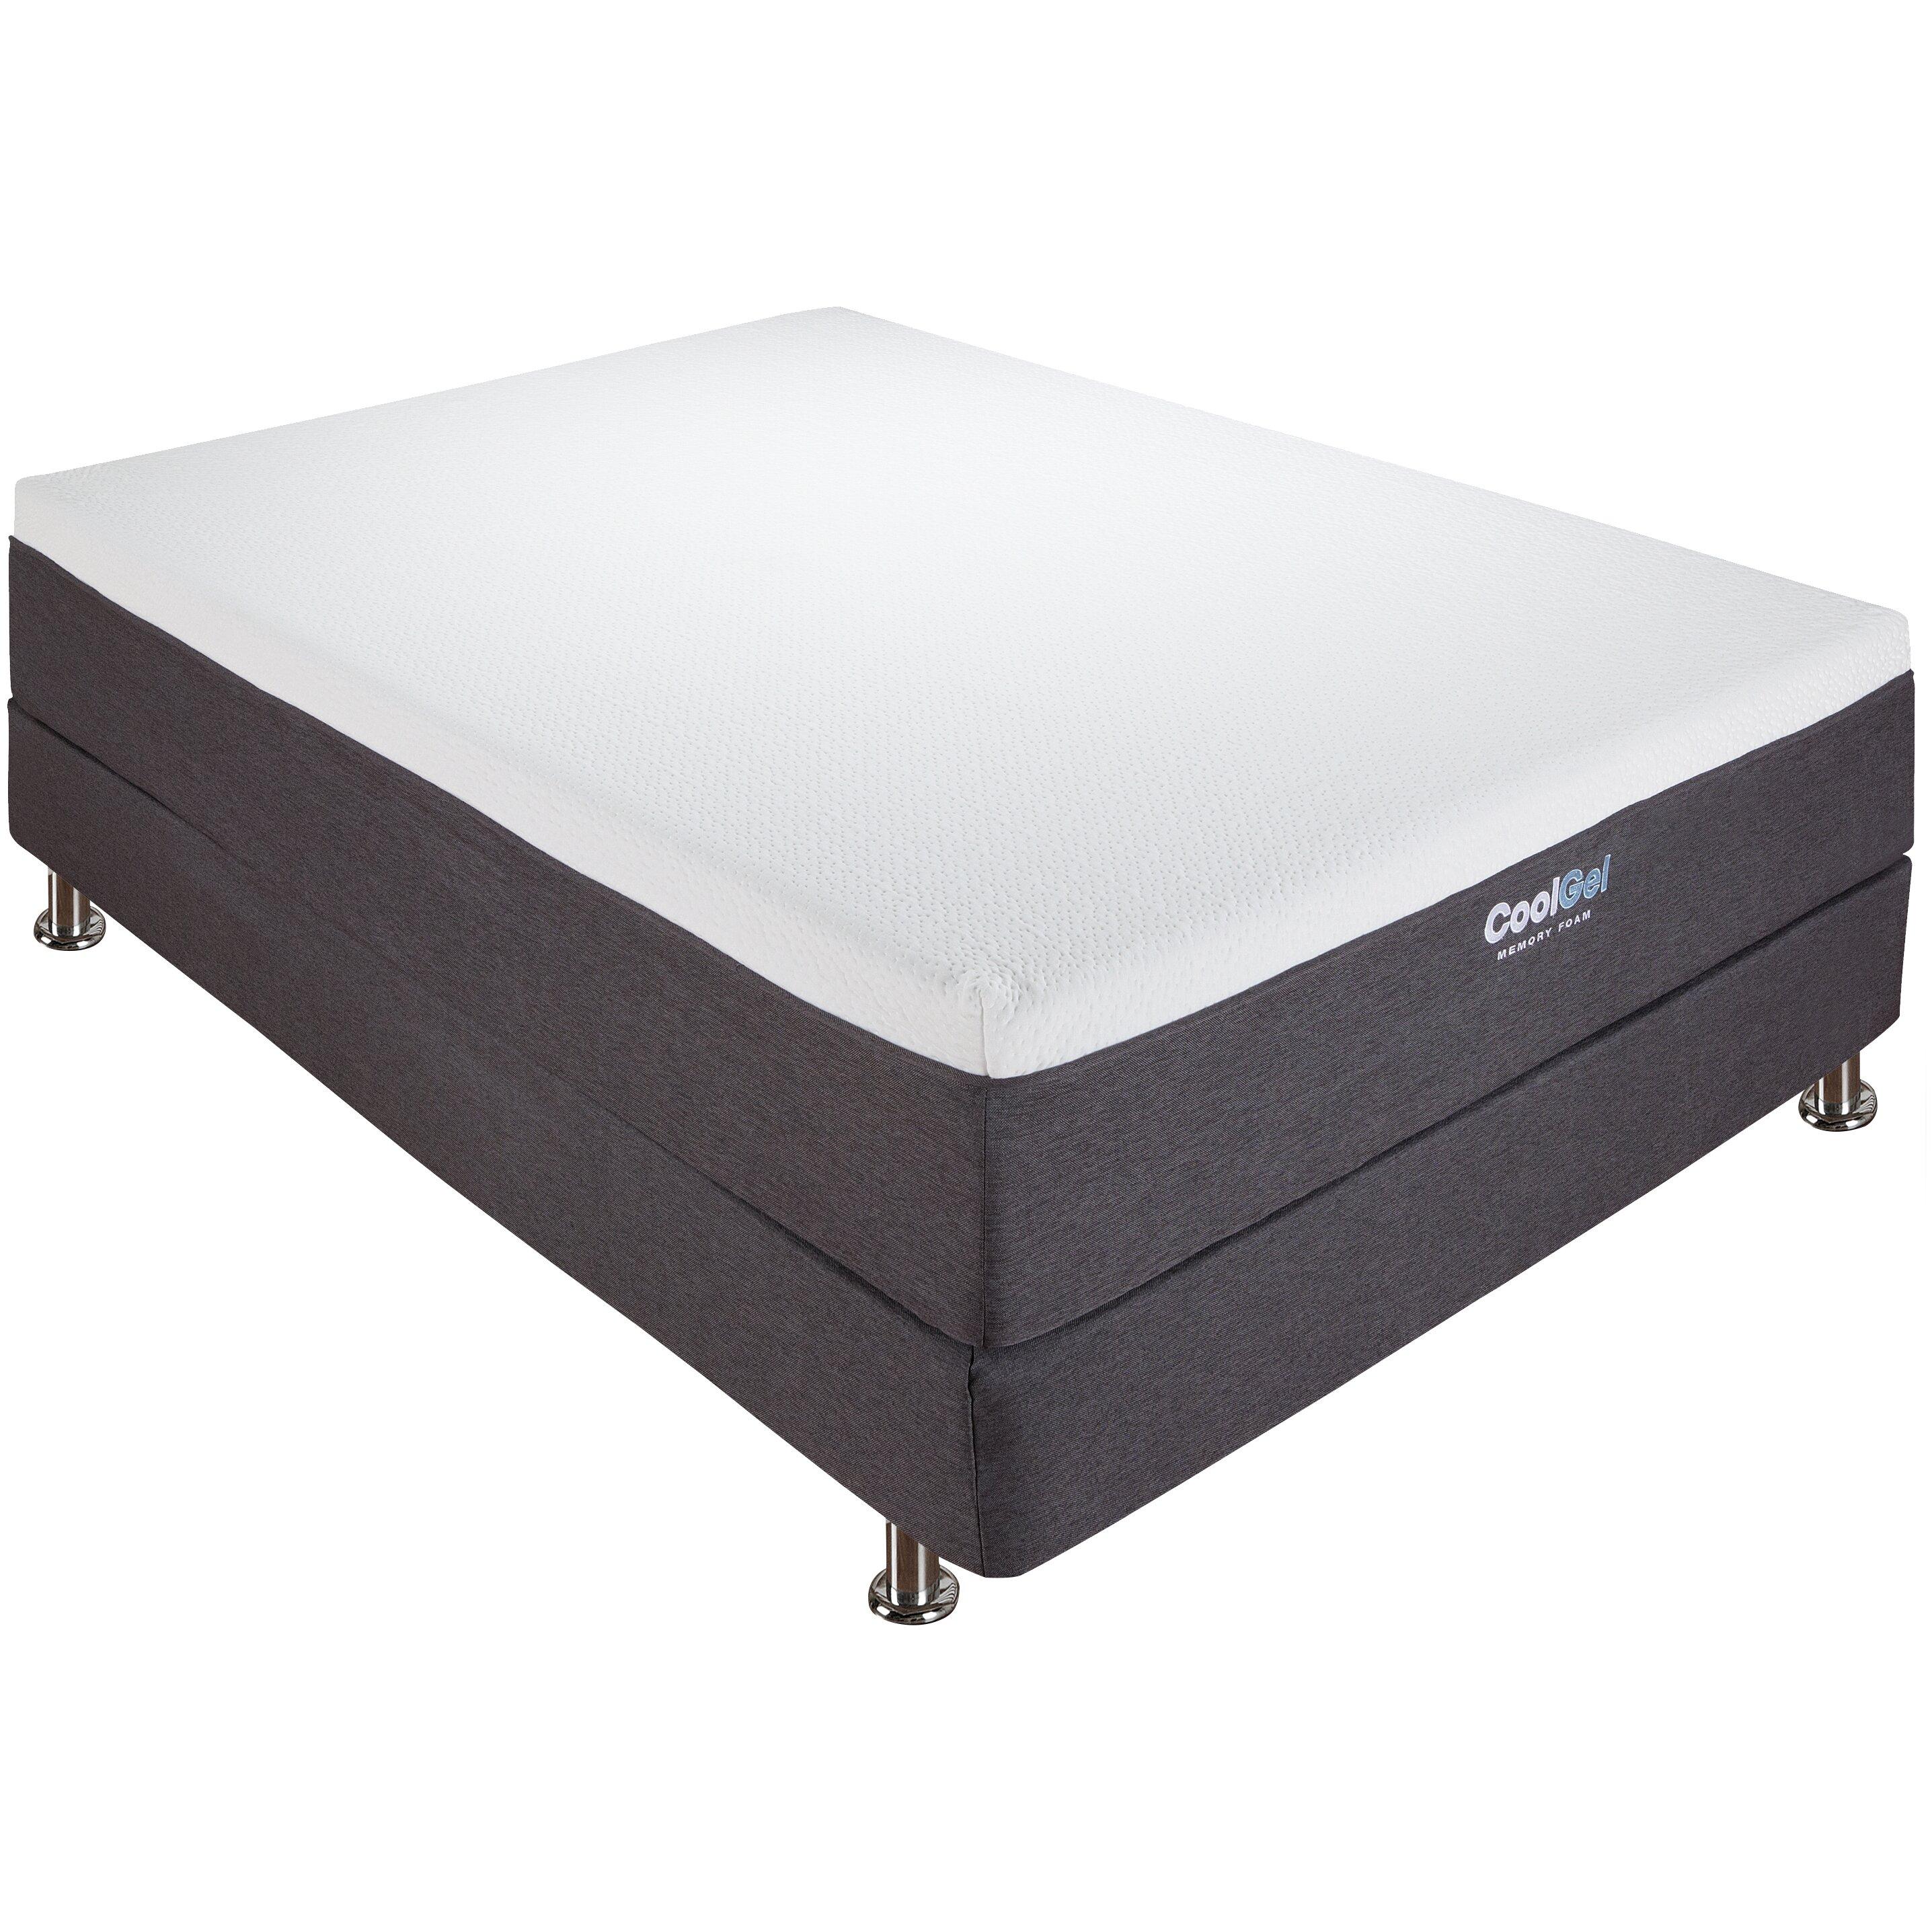 classic brands cool gel 12 gel memory foam mattress reviews wayfair. Black Bedroom Furniture Sets. Home Design Ideas